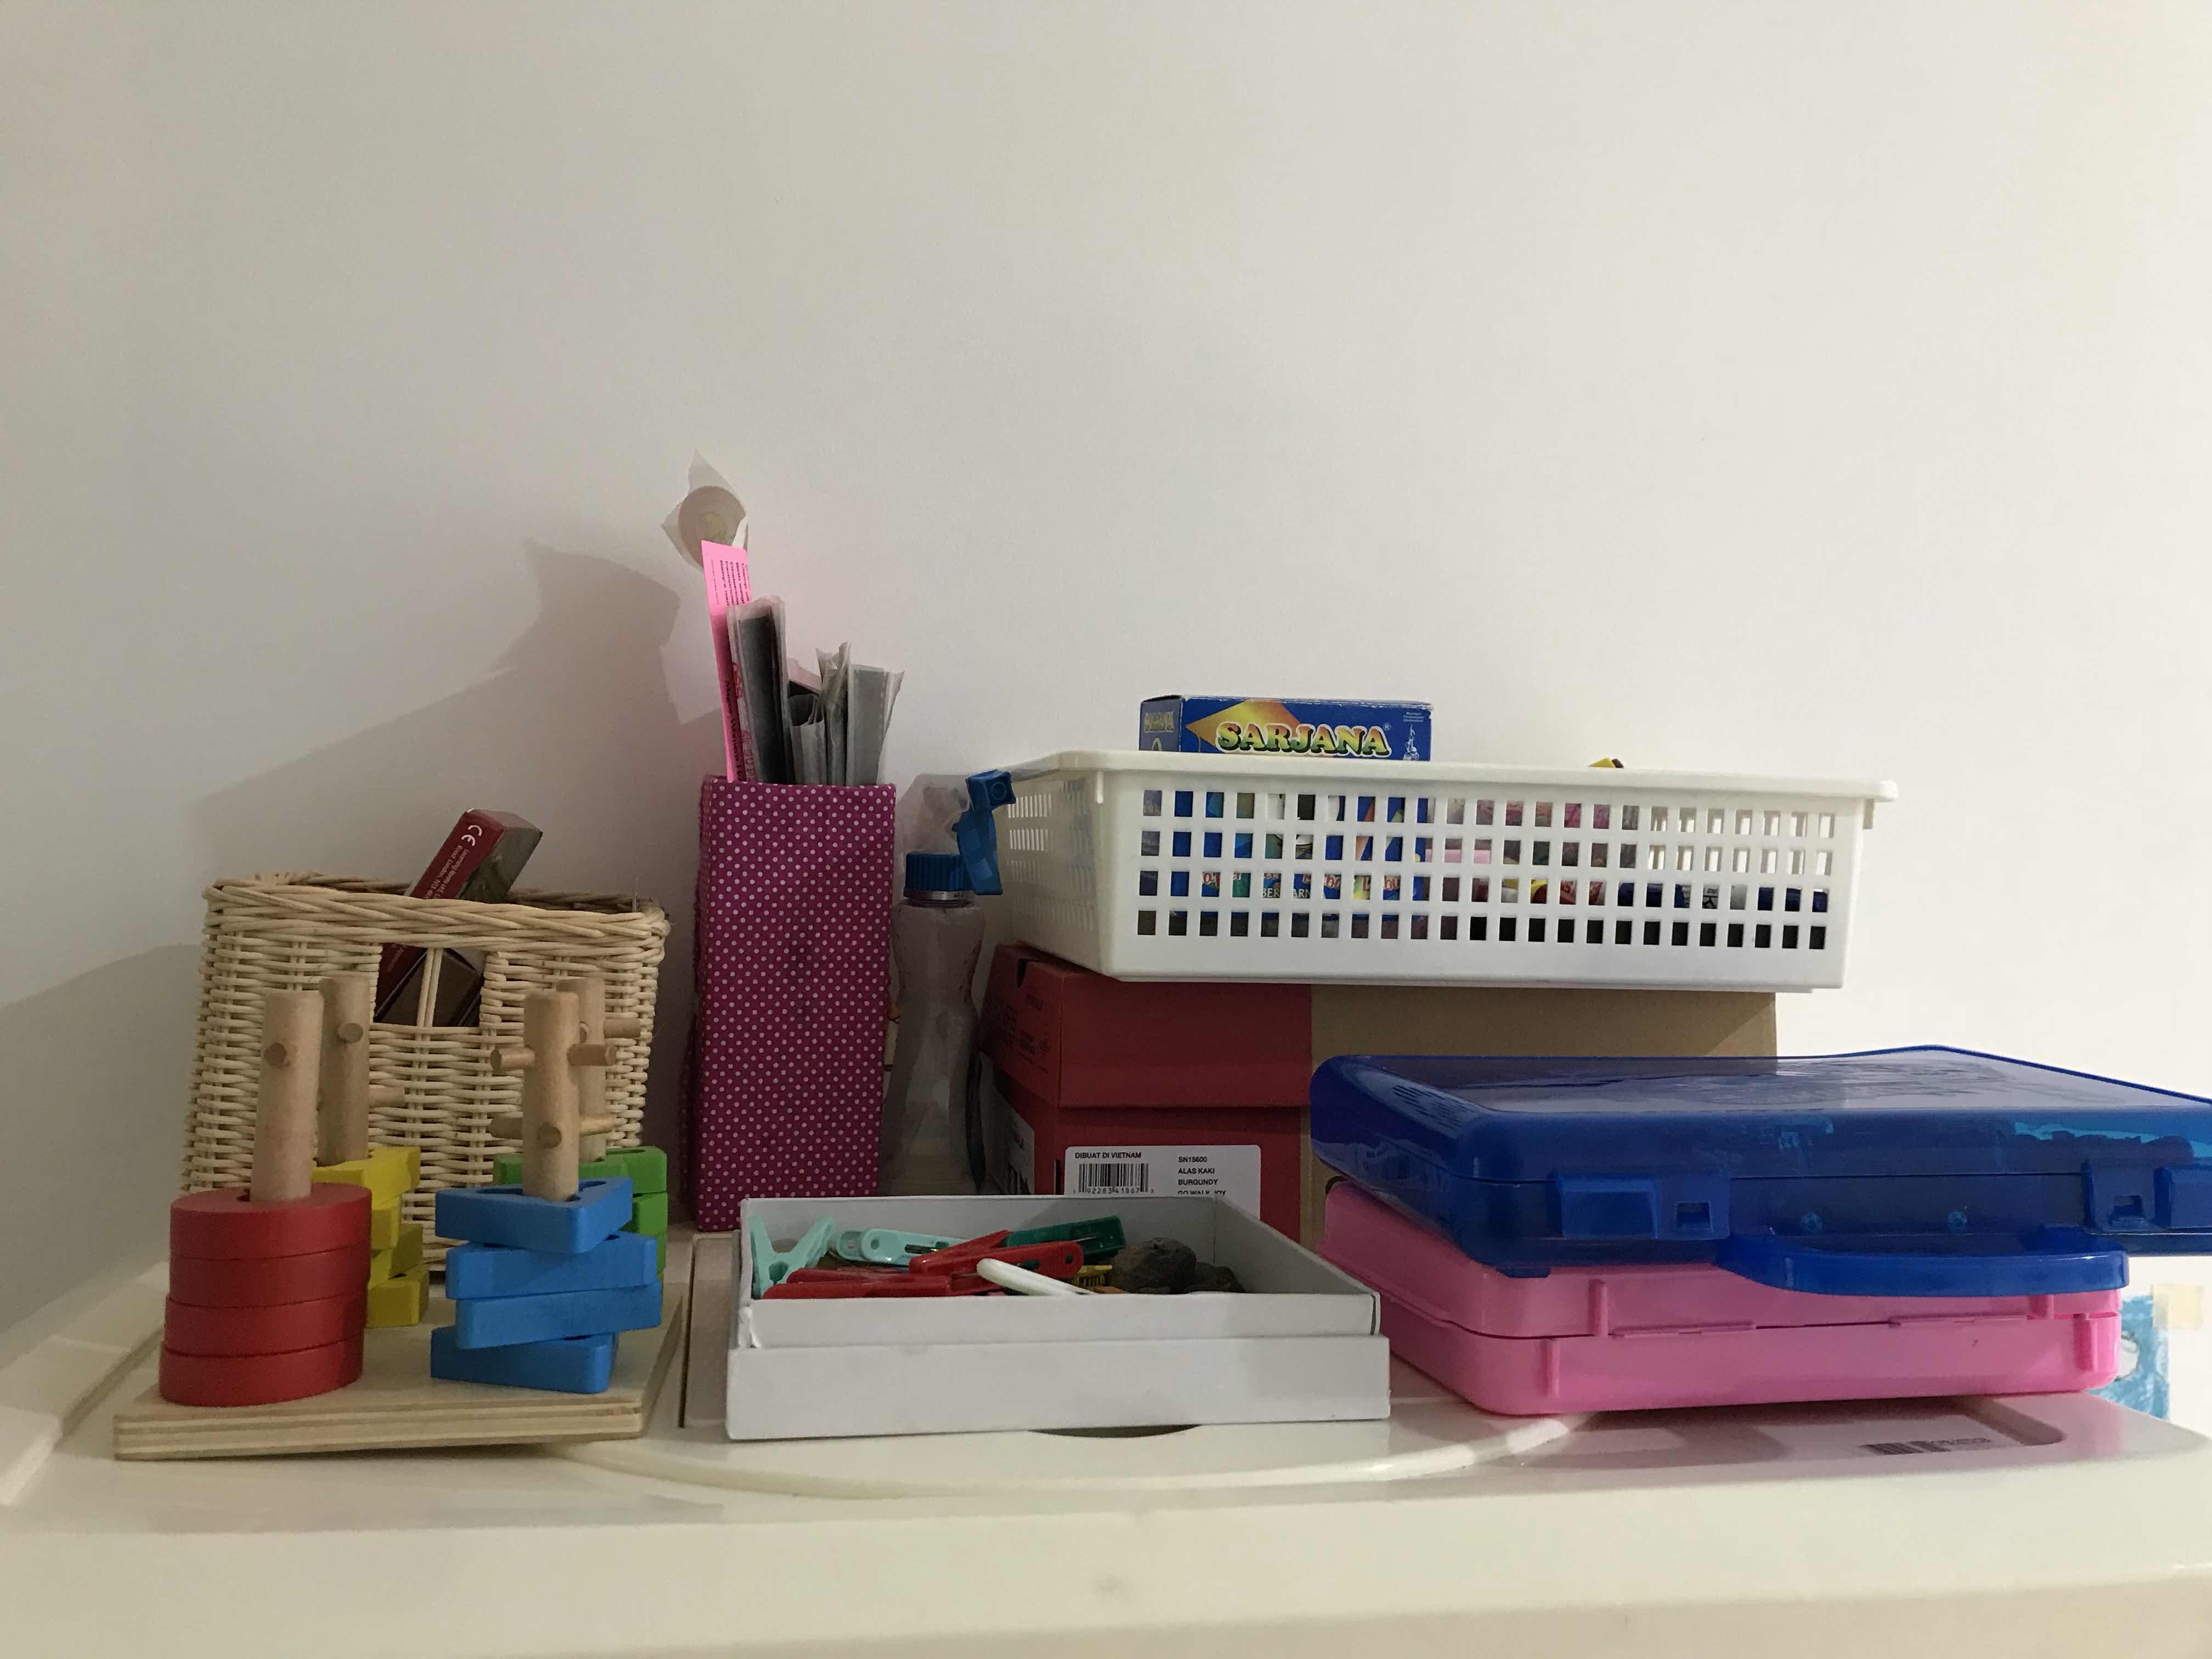 Mainan mainan sebagian saya simpan di rak baju saya yang kebetulan ada space kosong Box2 diatas tempat tidur tingkat dirapikan dan posisi rak mainan sudah